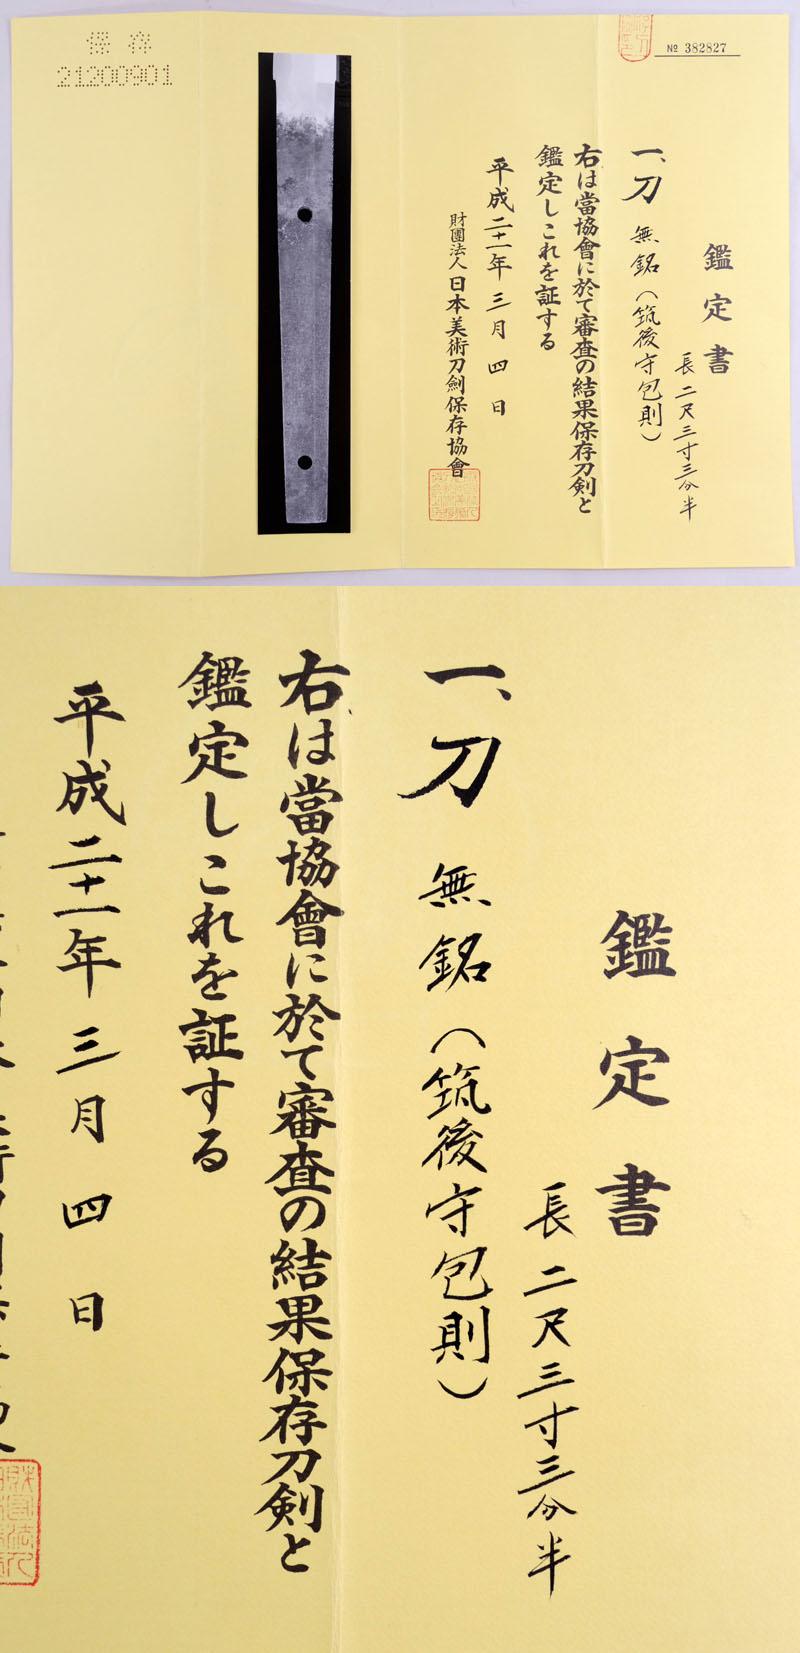 無銘(筑後守包則) Picture of Certificate